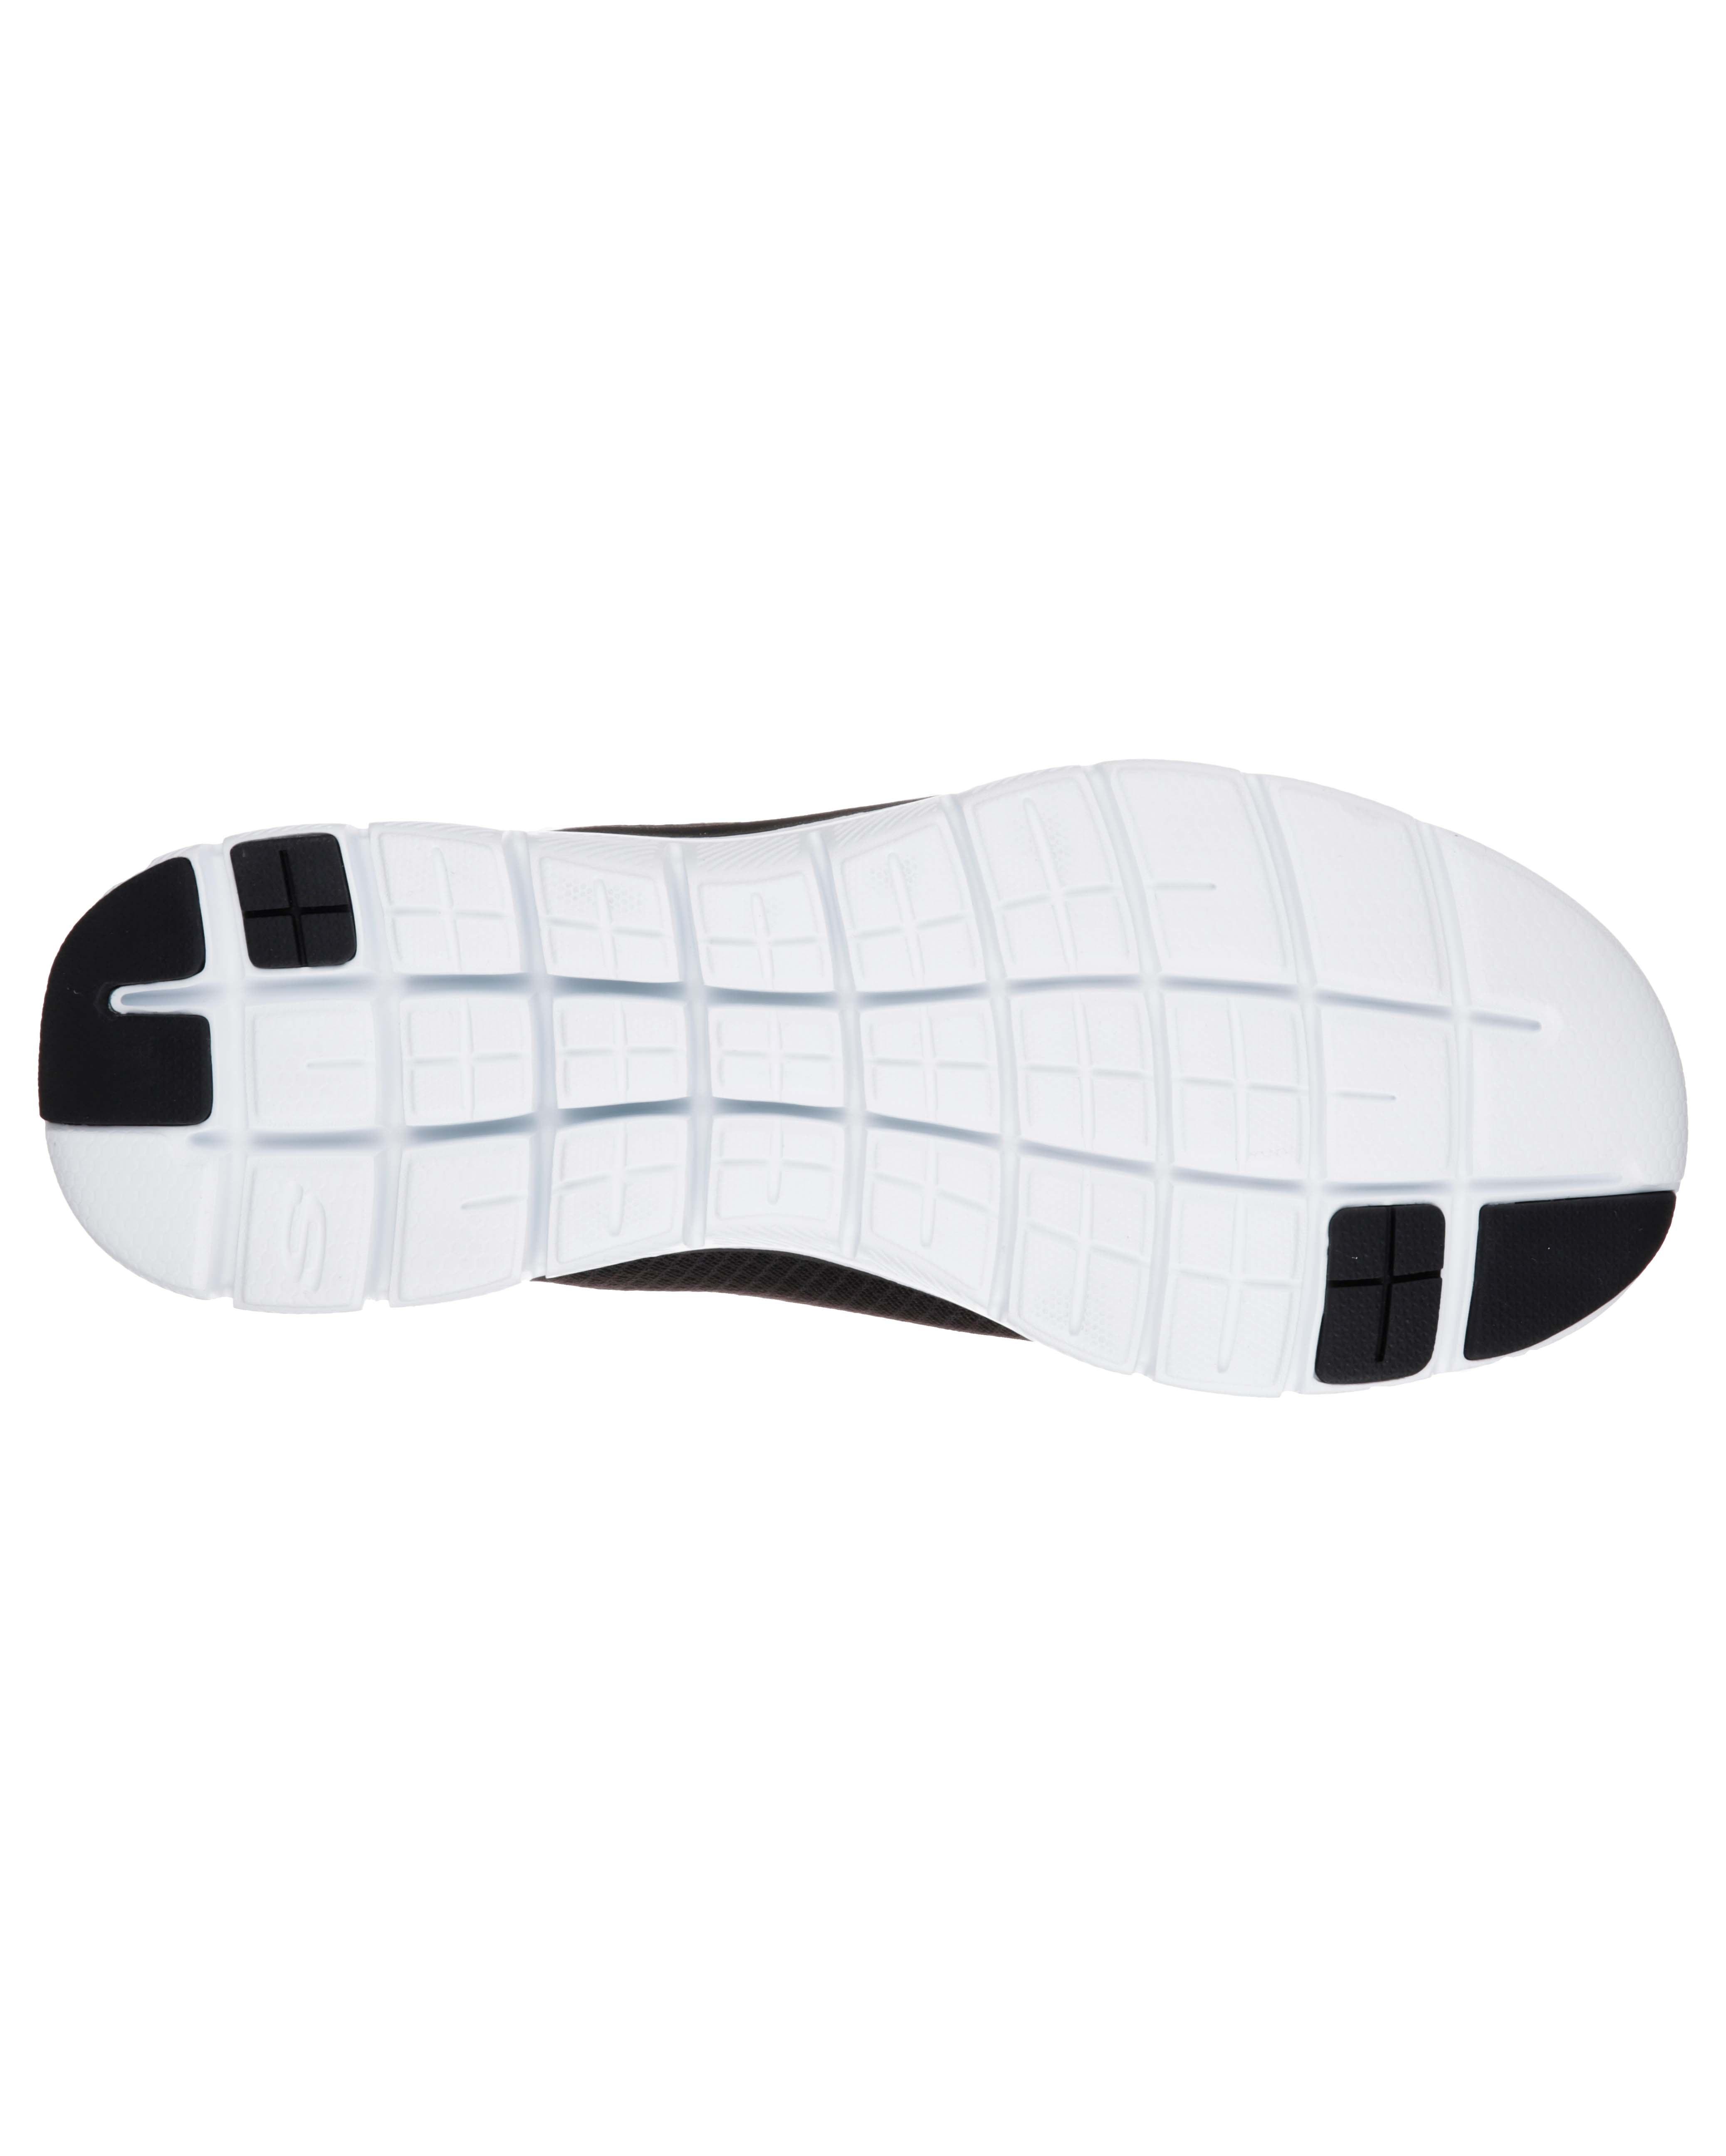 Skechers Mens FleSkechers Mens Flex Advantage 2.0 - Black/Whitex Advantage 2.0 - Black/White